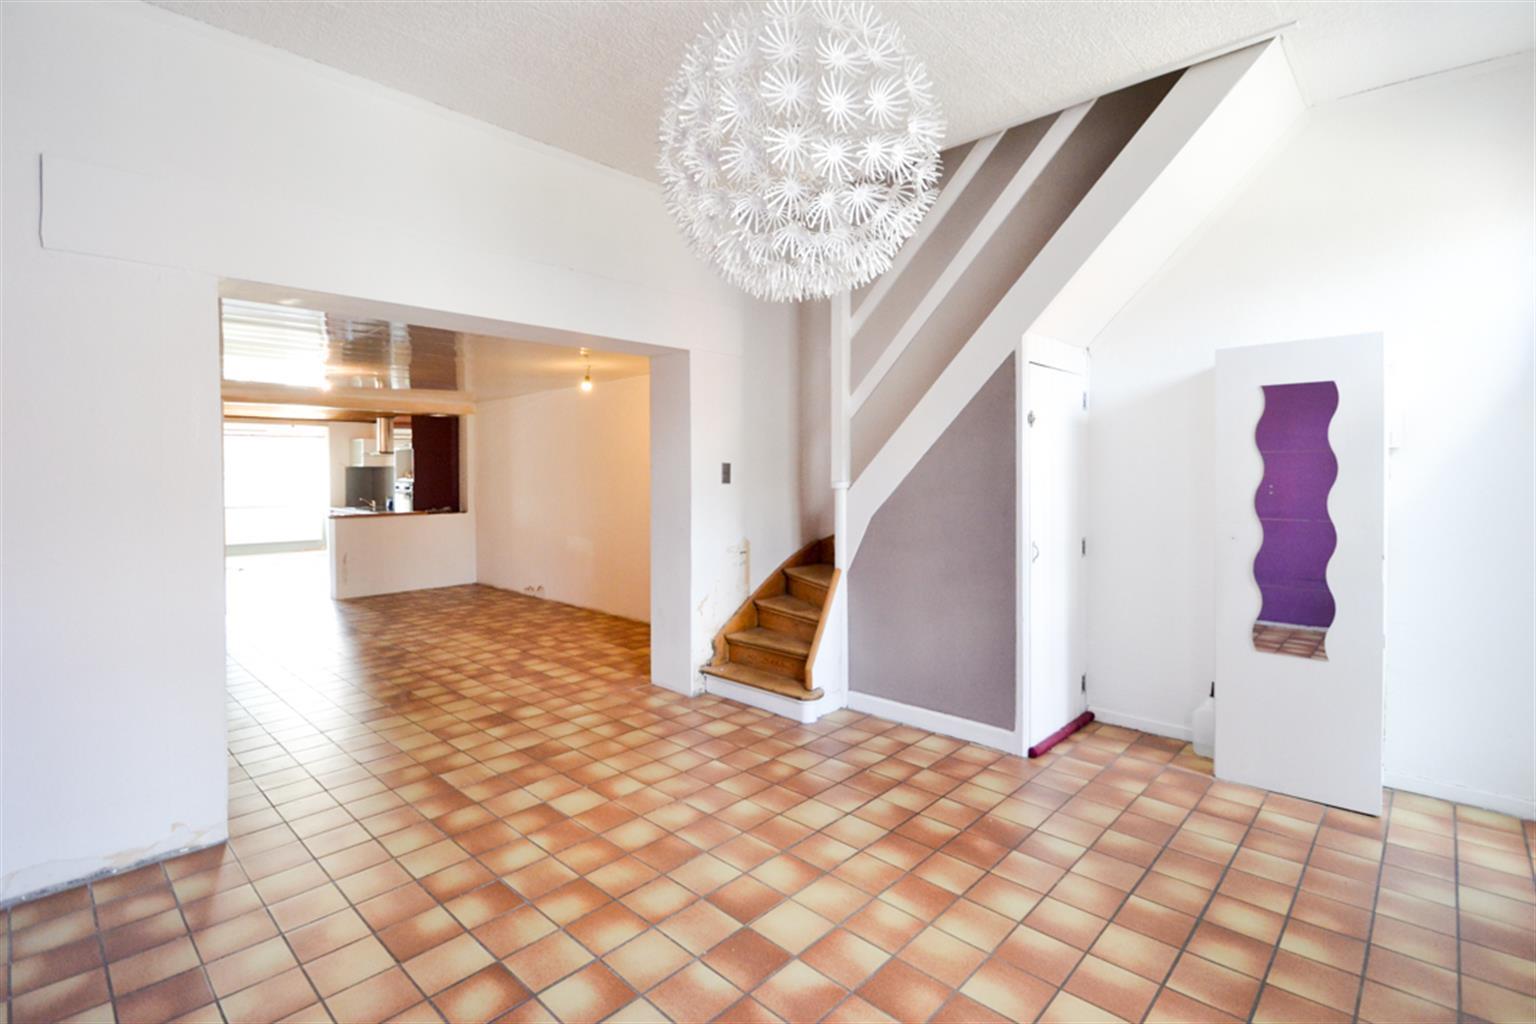 Maison - Charleroi Couillet - #3552881-1